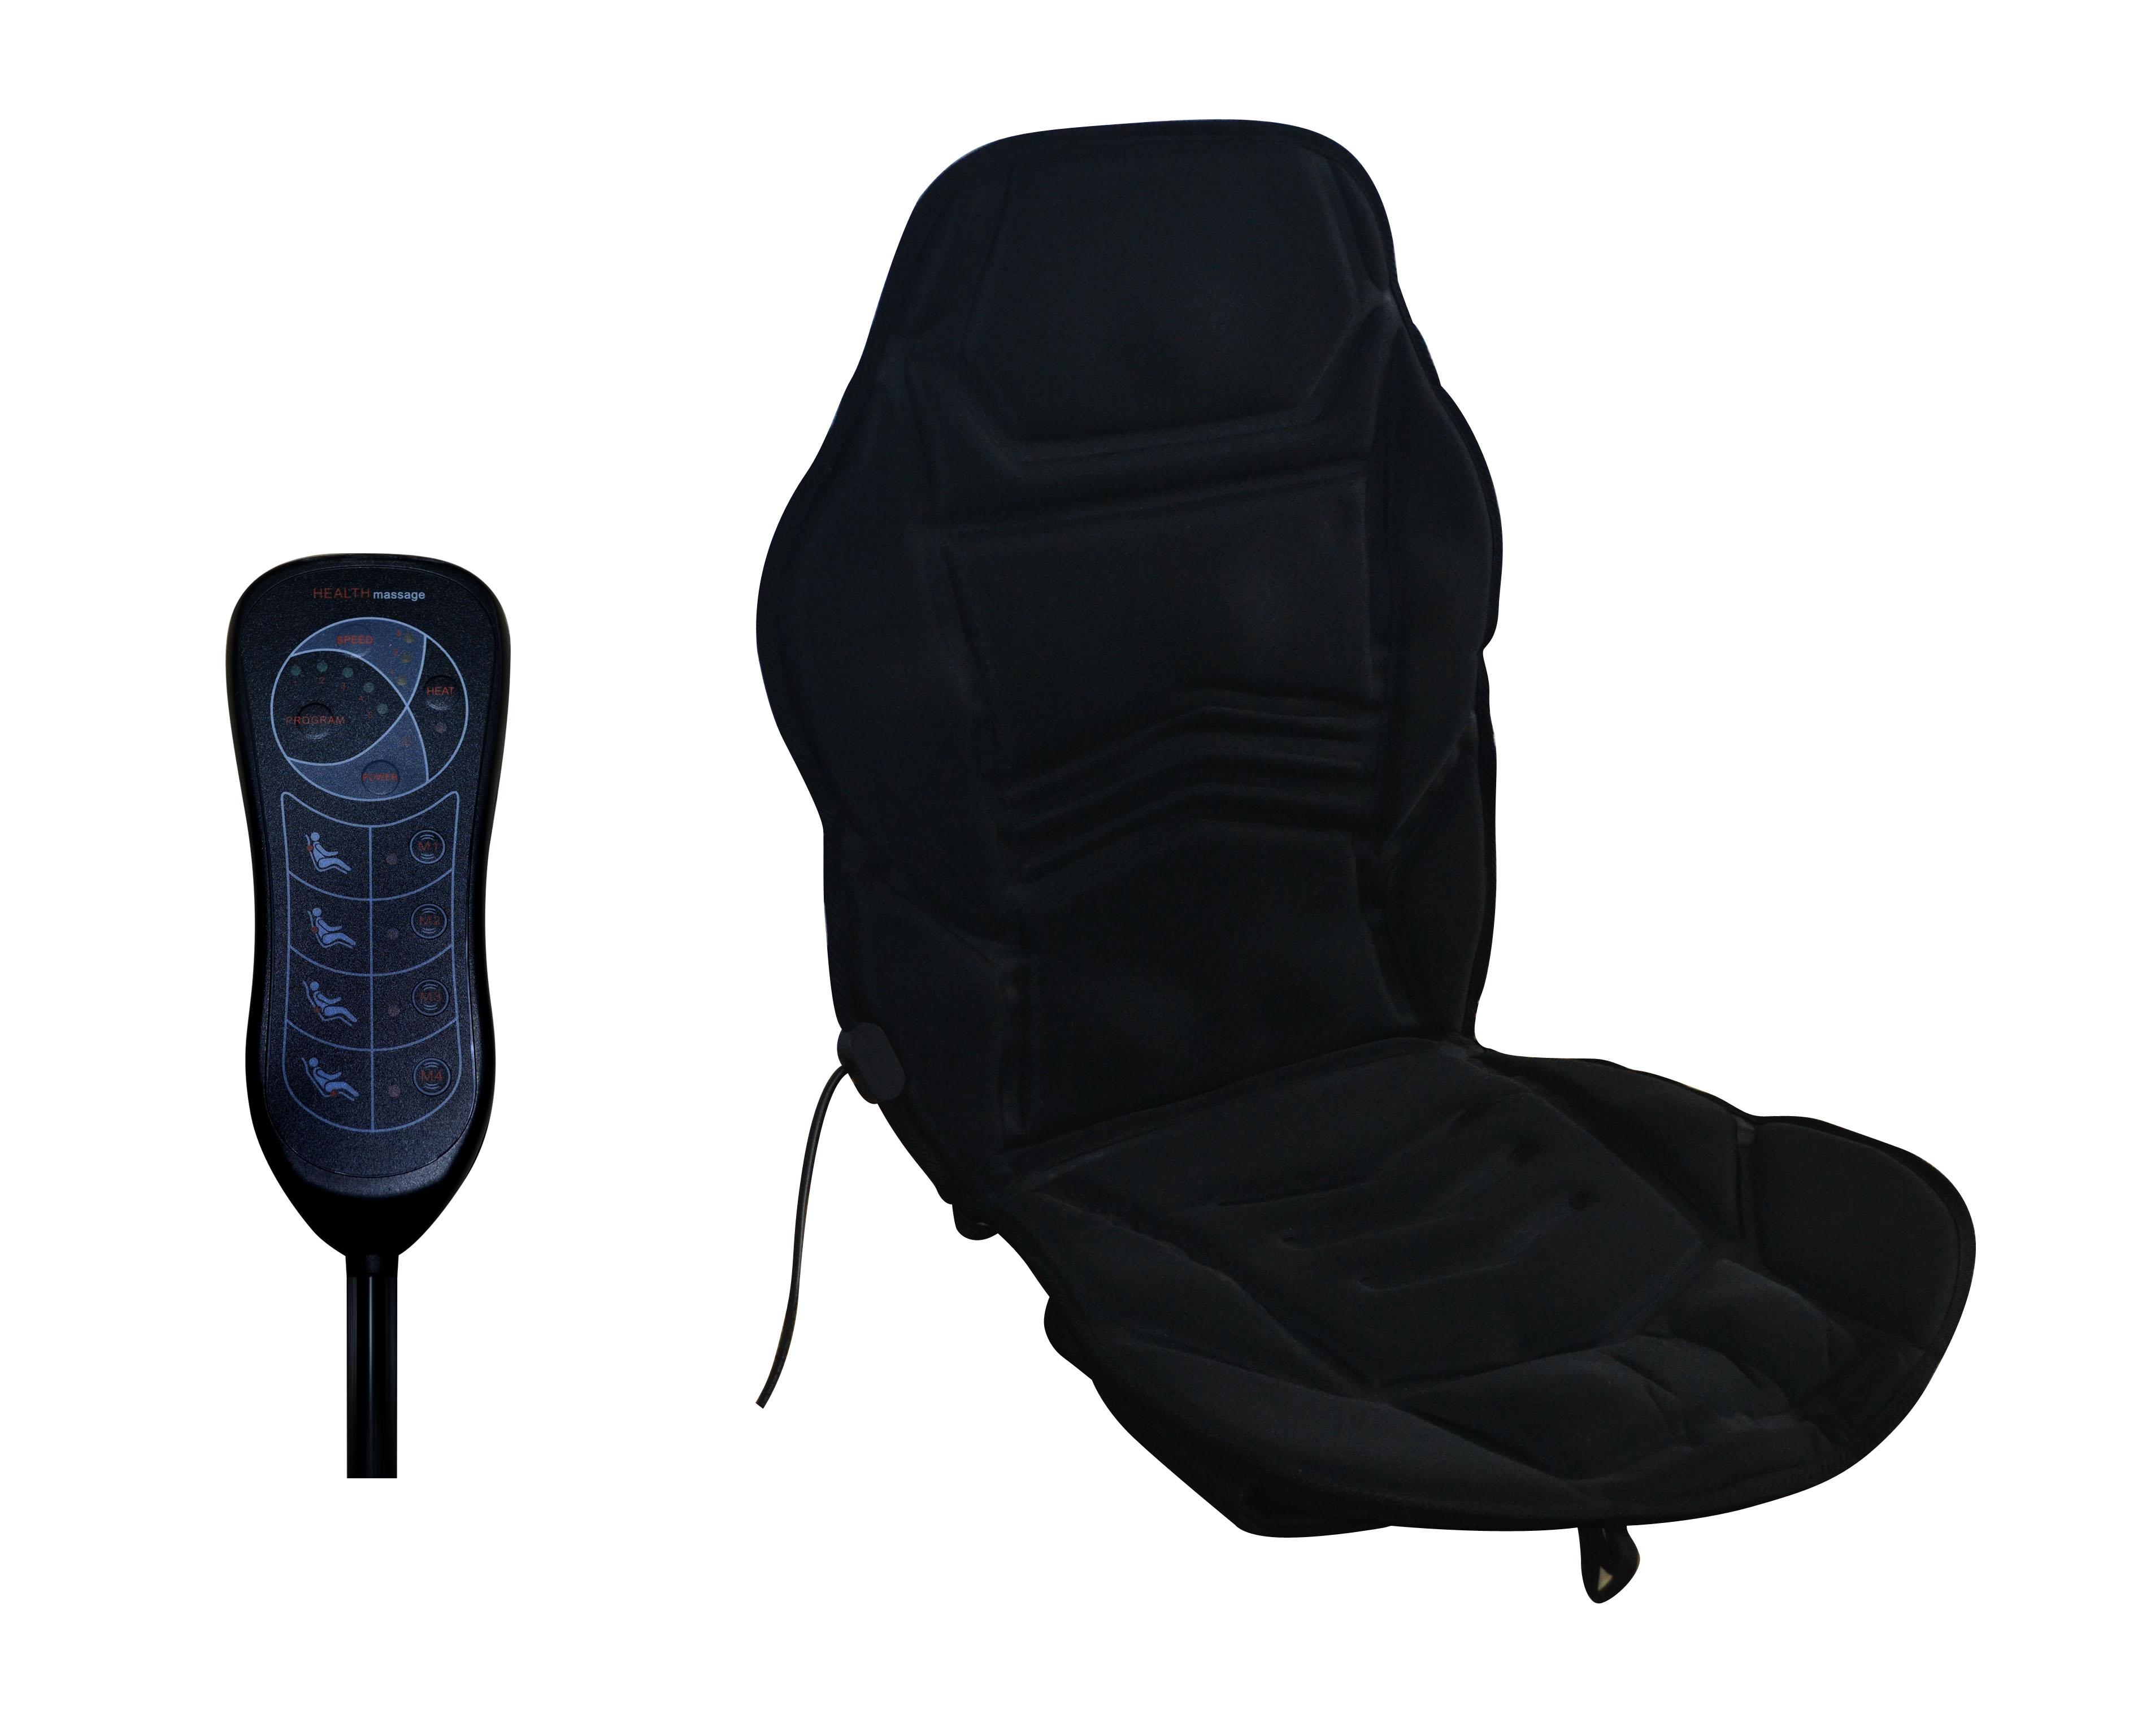 Vibration 10 Motor Full Body Massage Cushion Pad Neck Back Heat